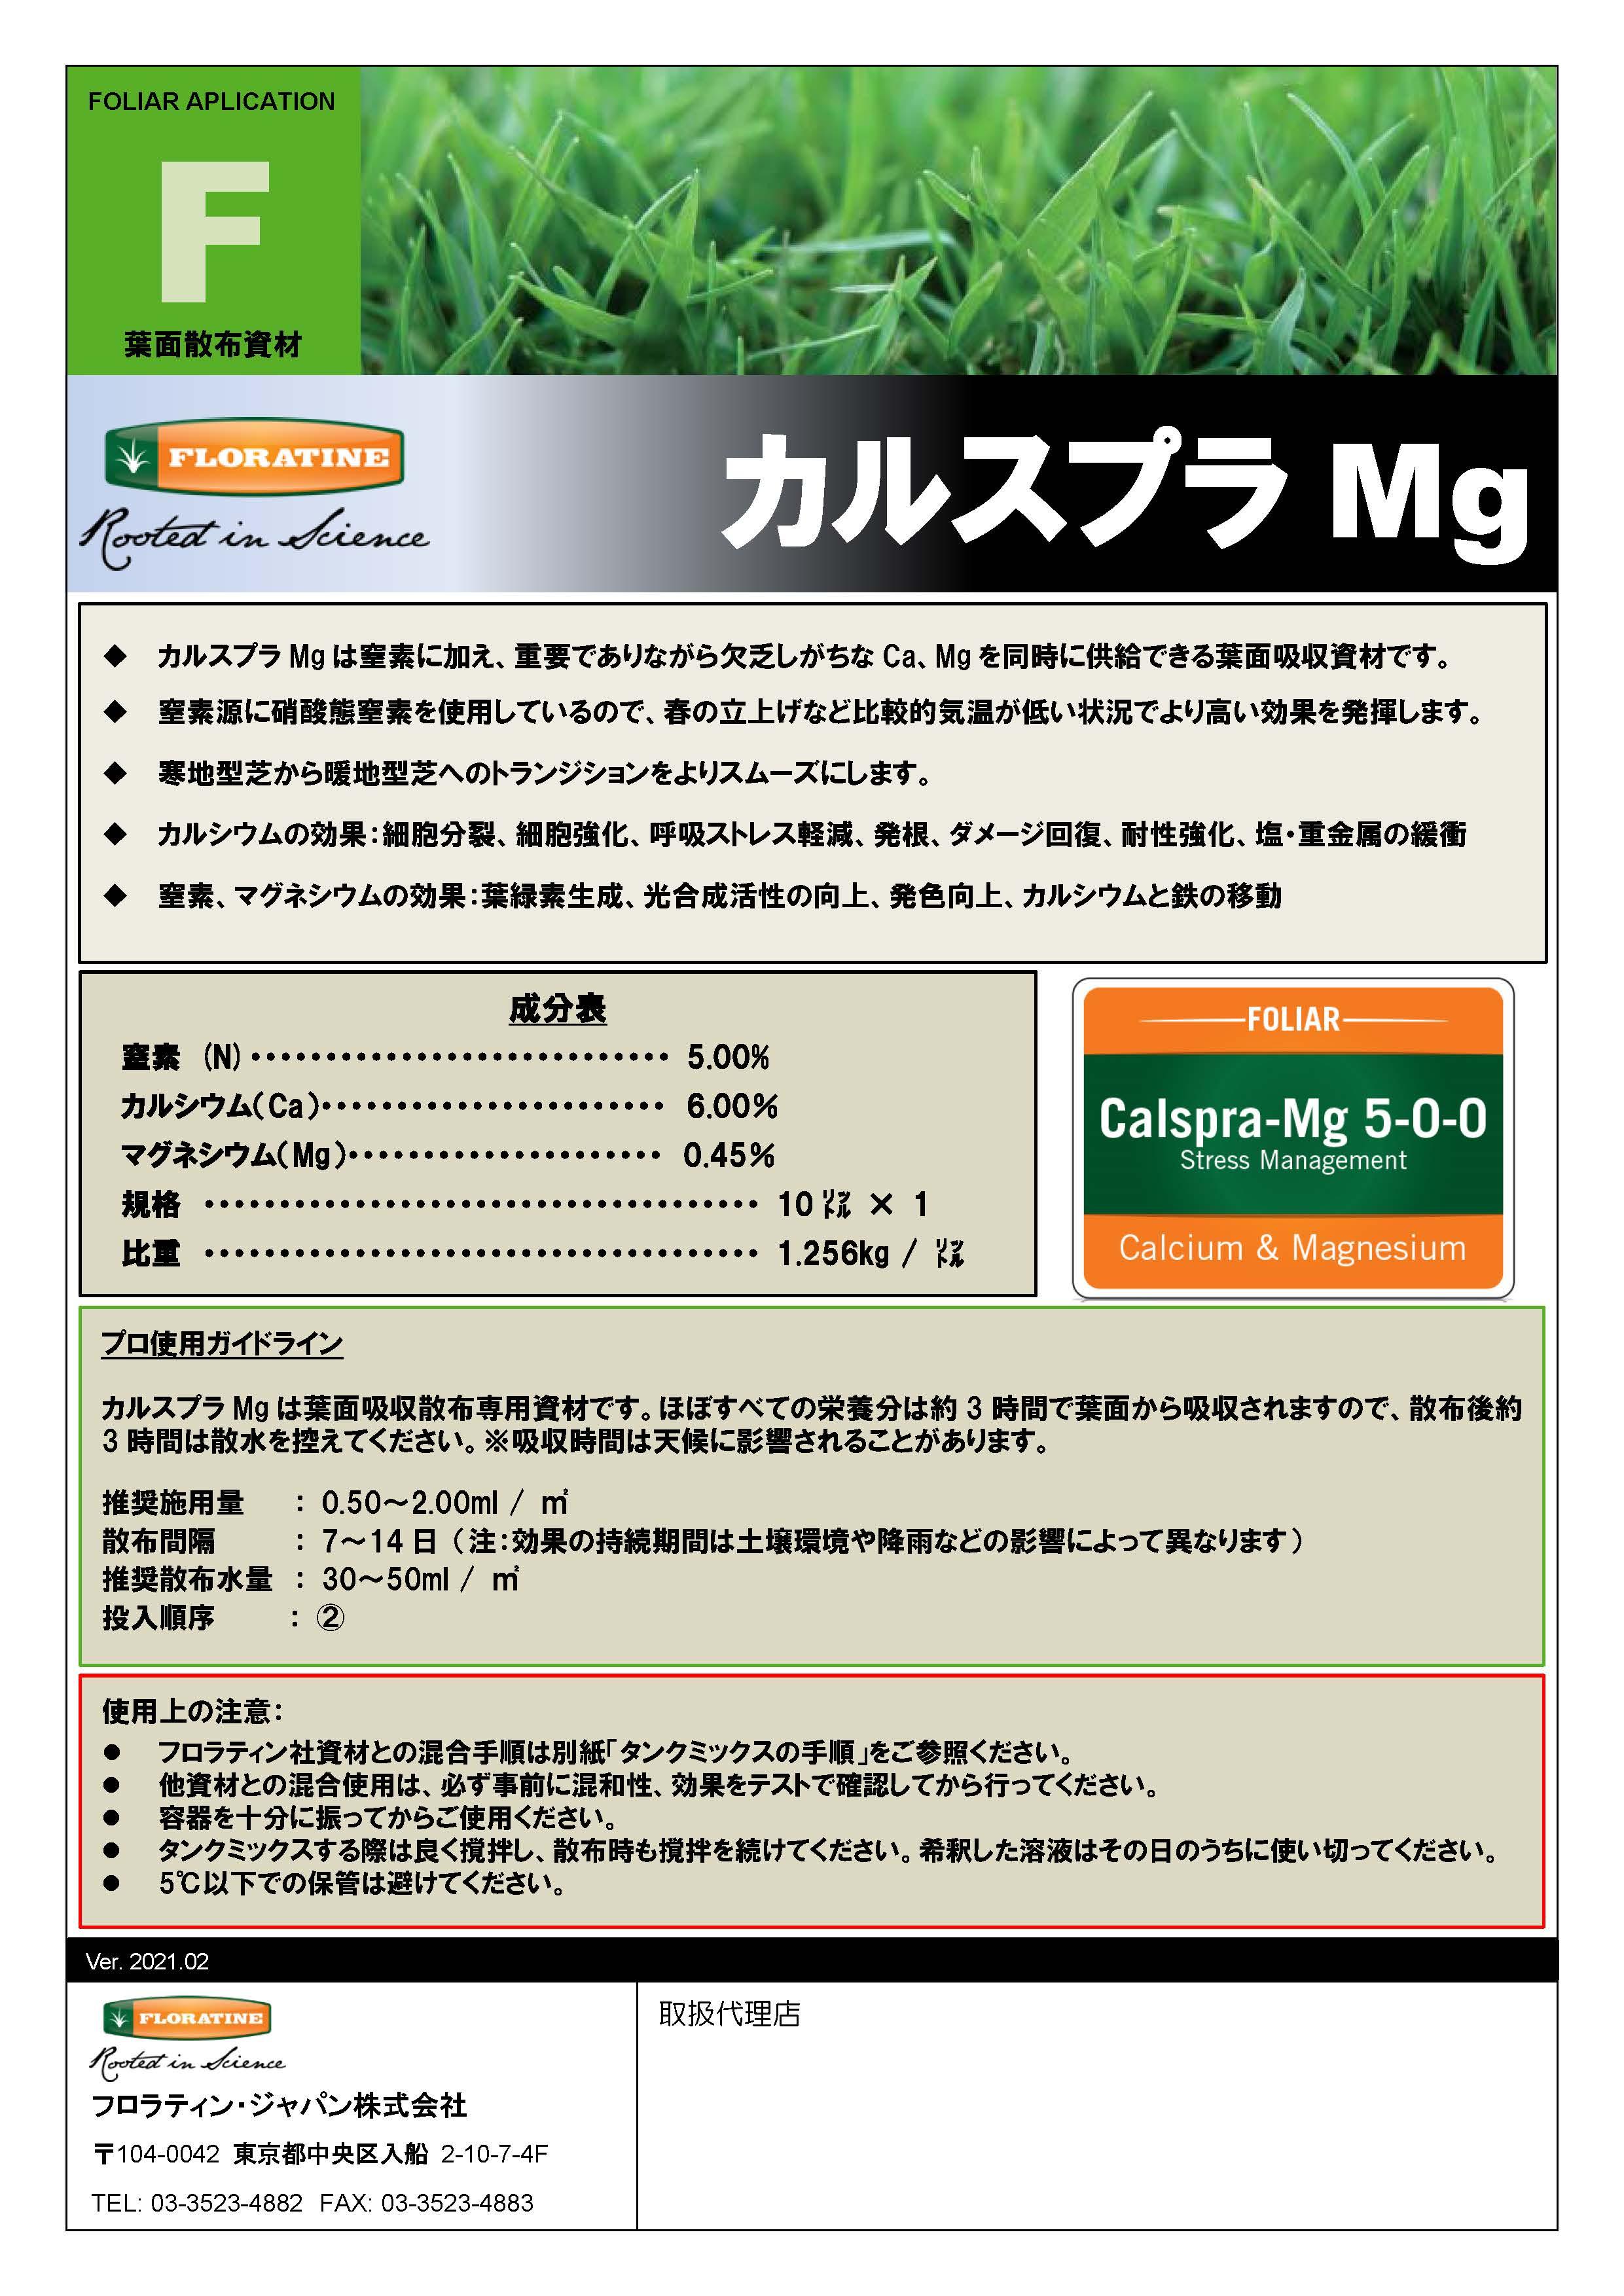 Calspra-Mg (2021.2.1)